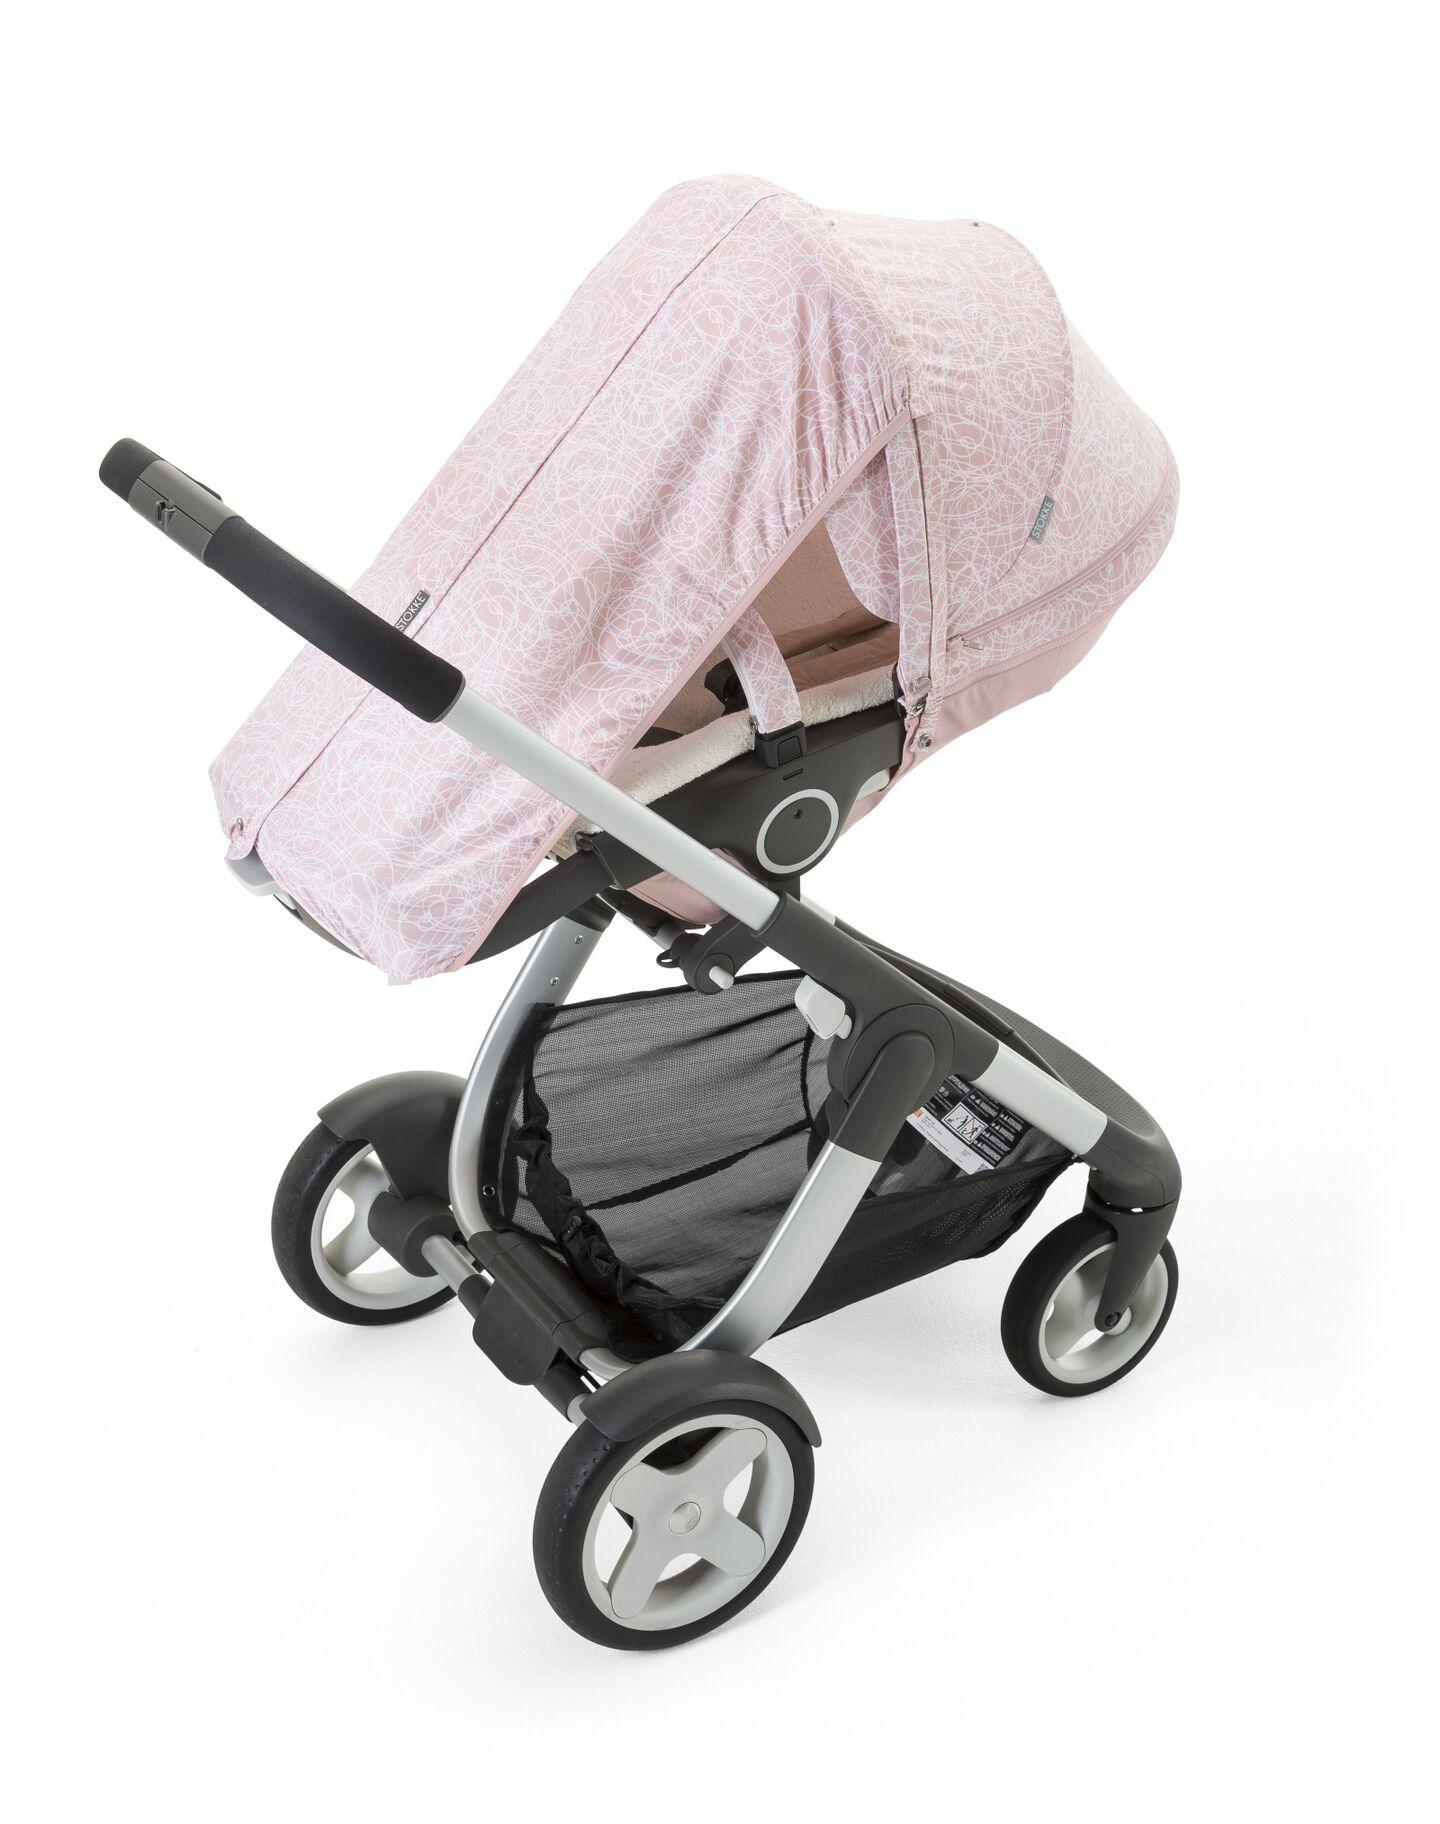 Stokke® Crusi™ with Stokke® Stroller Summer Kit Scribble Faded Pink.